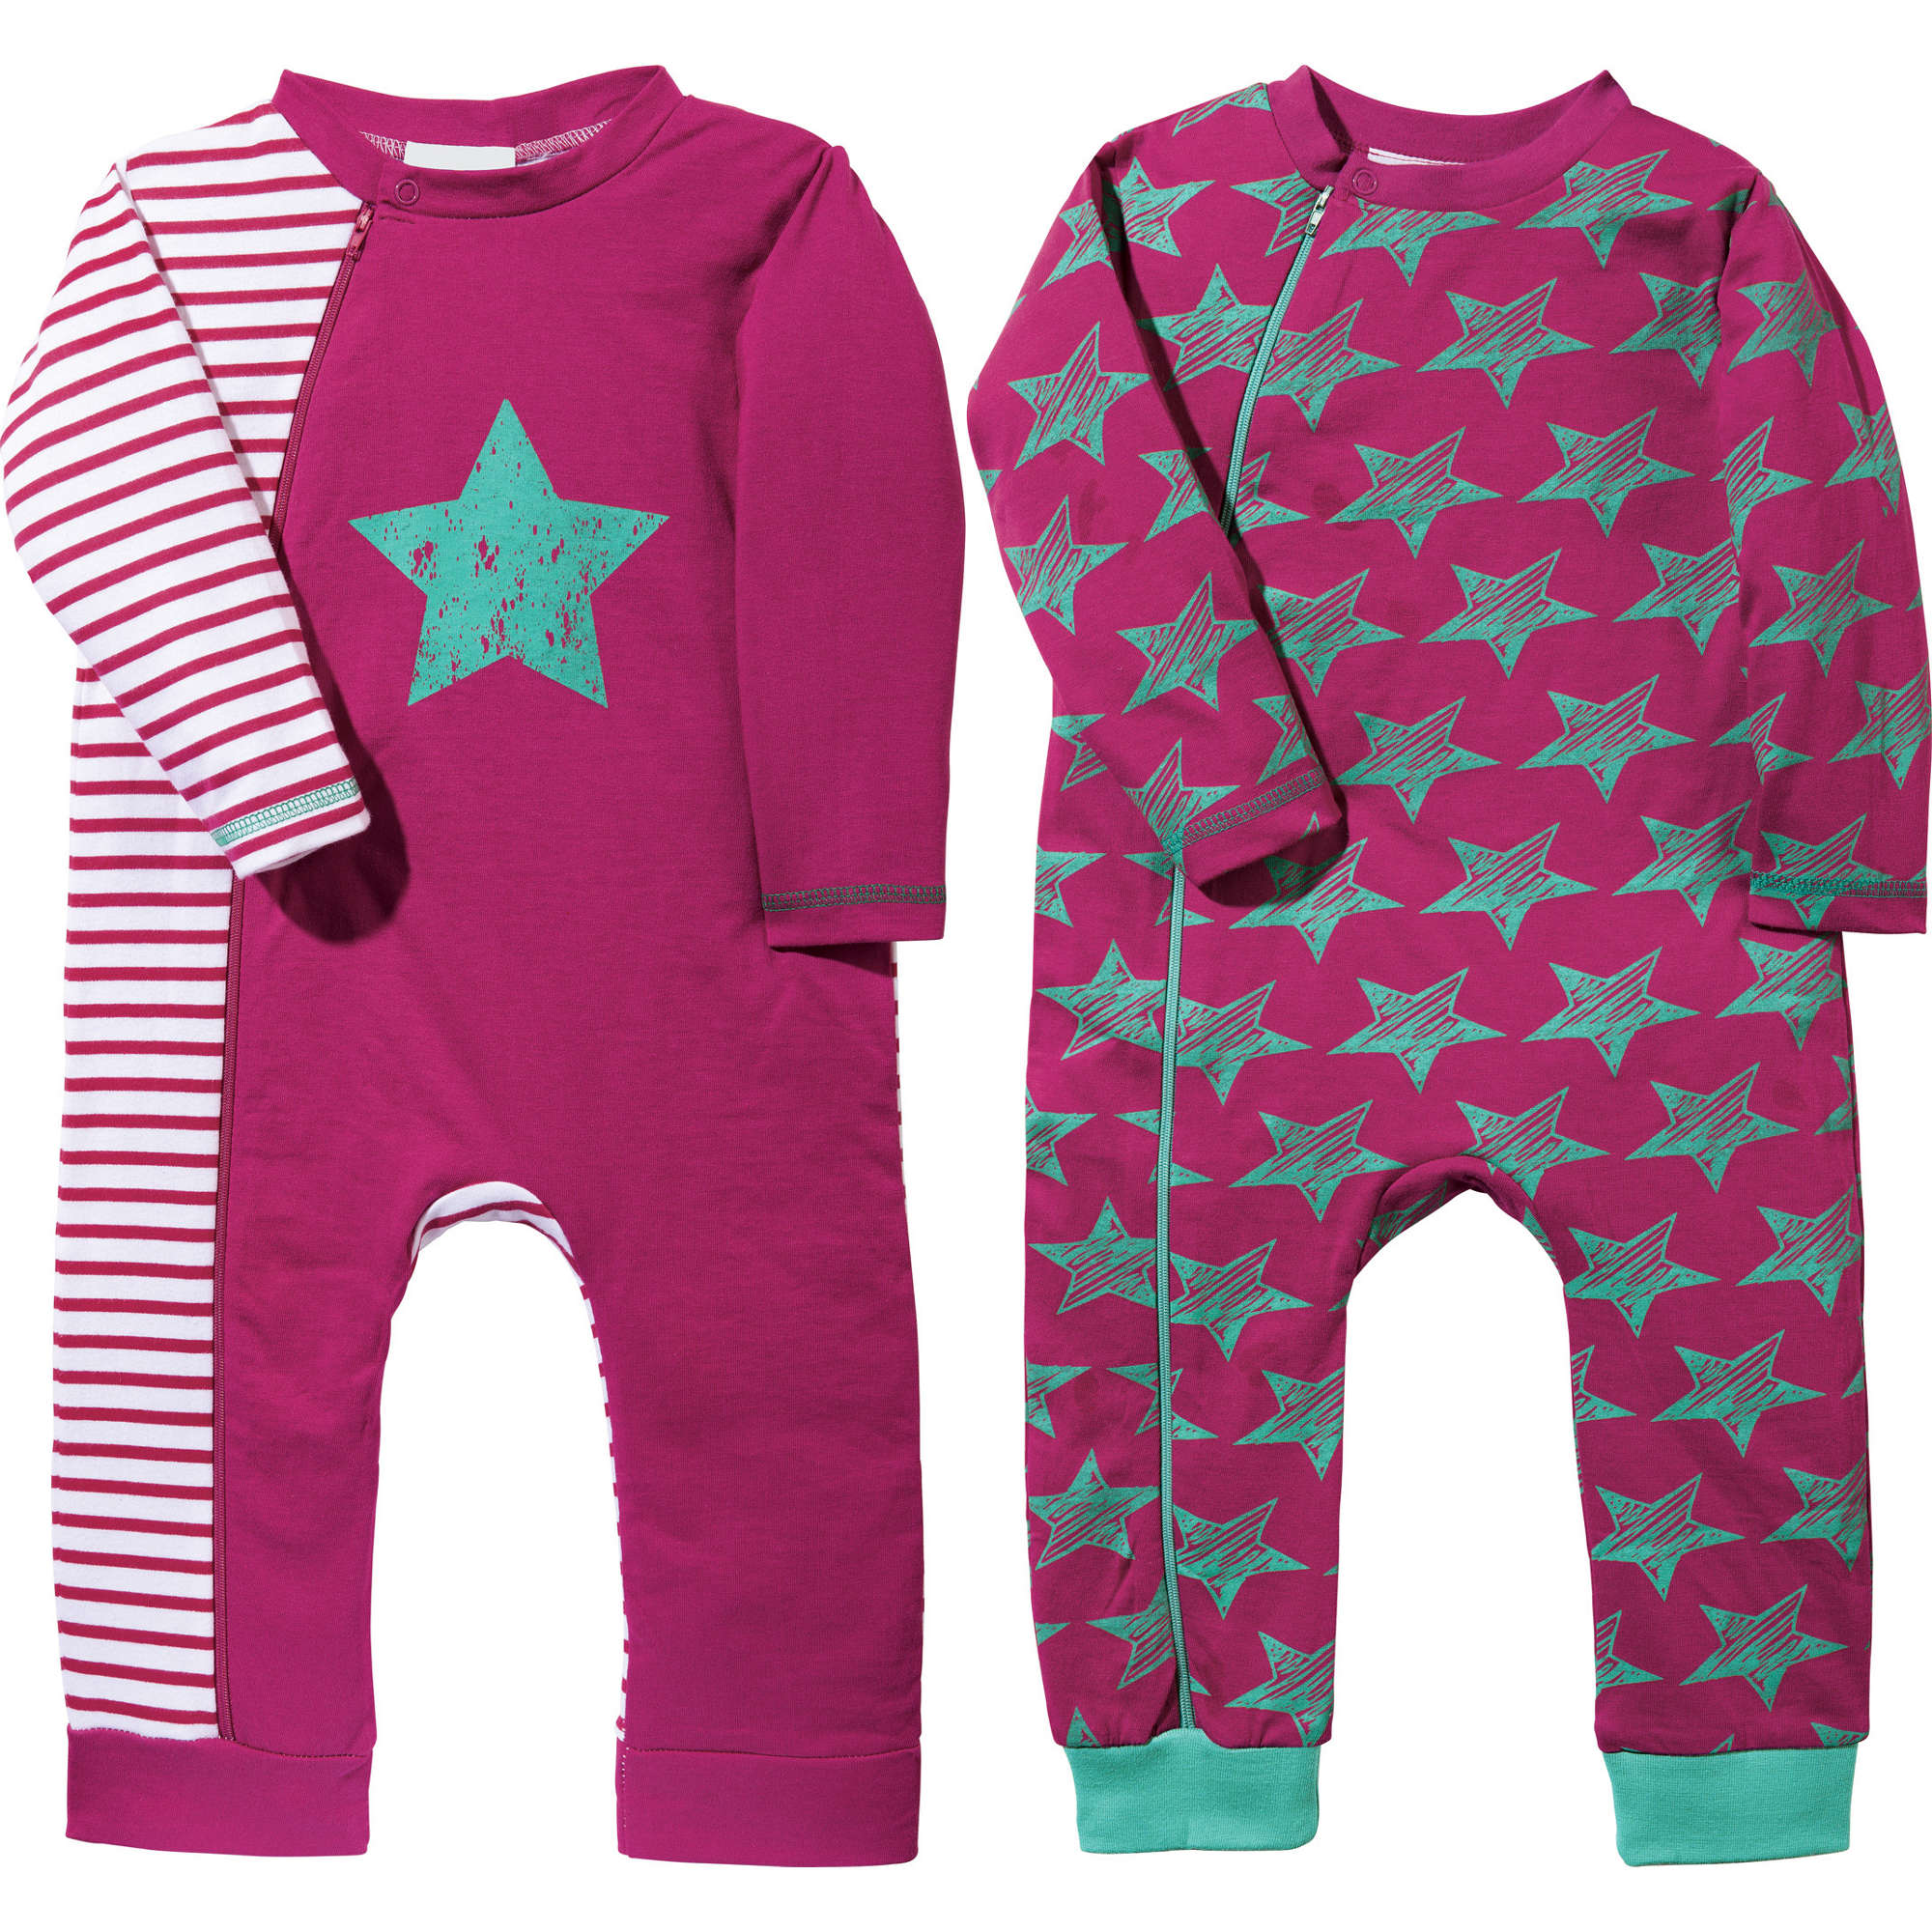 baby butt schlafanzug 2er pack interlock jersey ebay. Black Bedroom Furniture Sets. Home Design Ideas